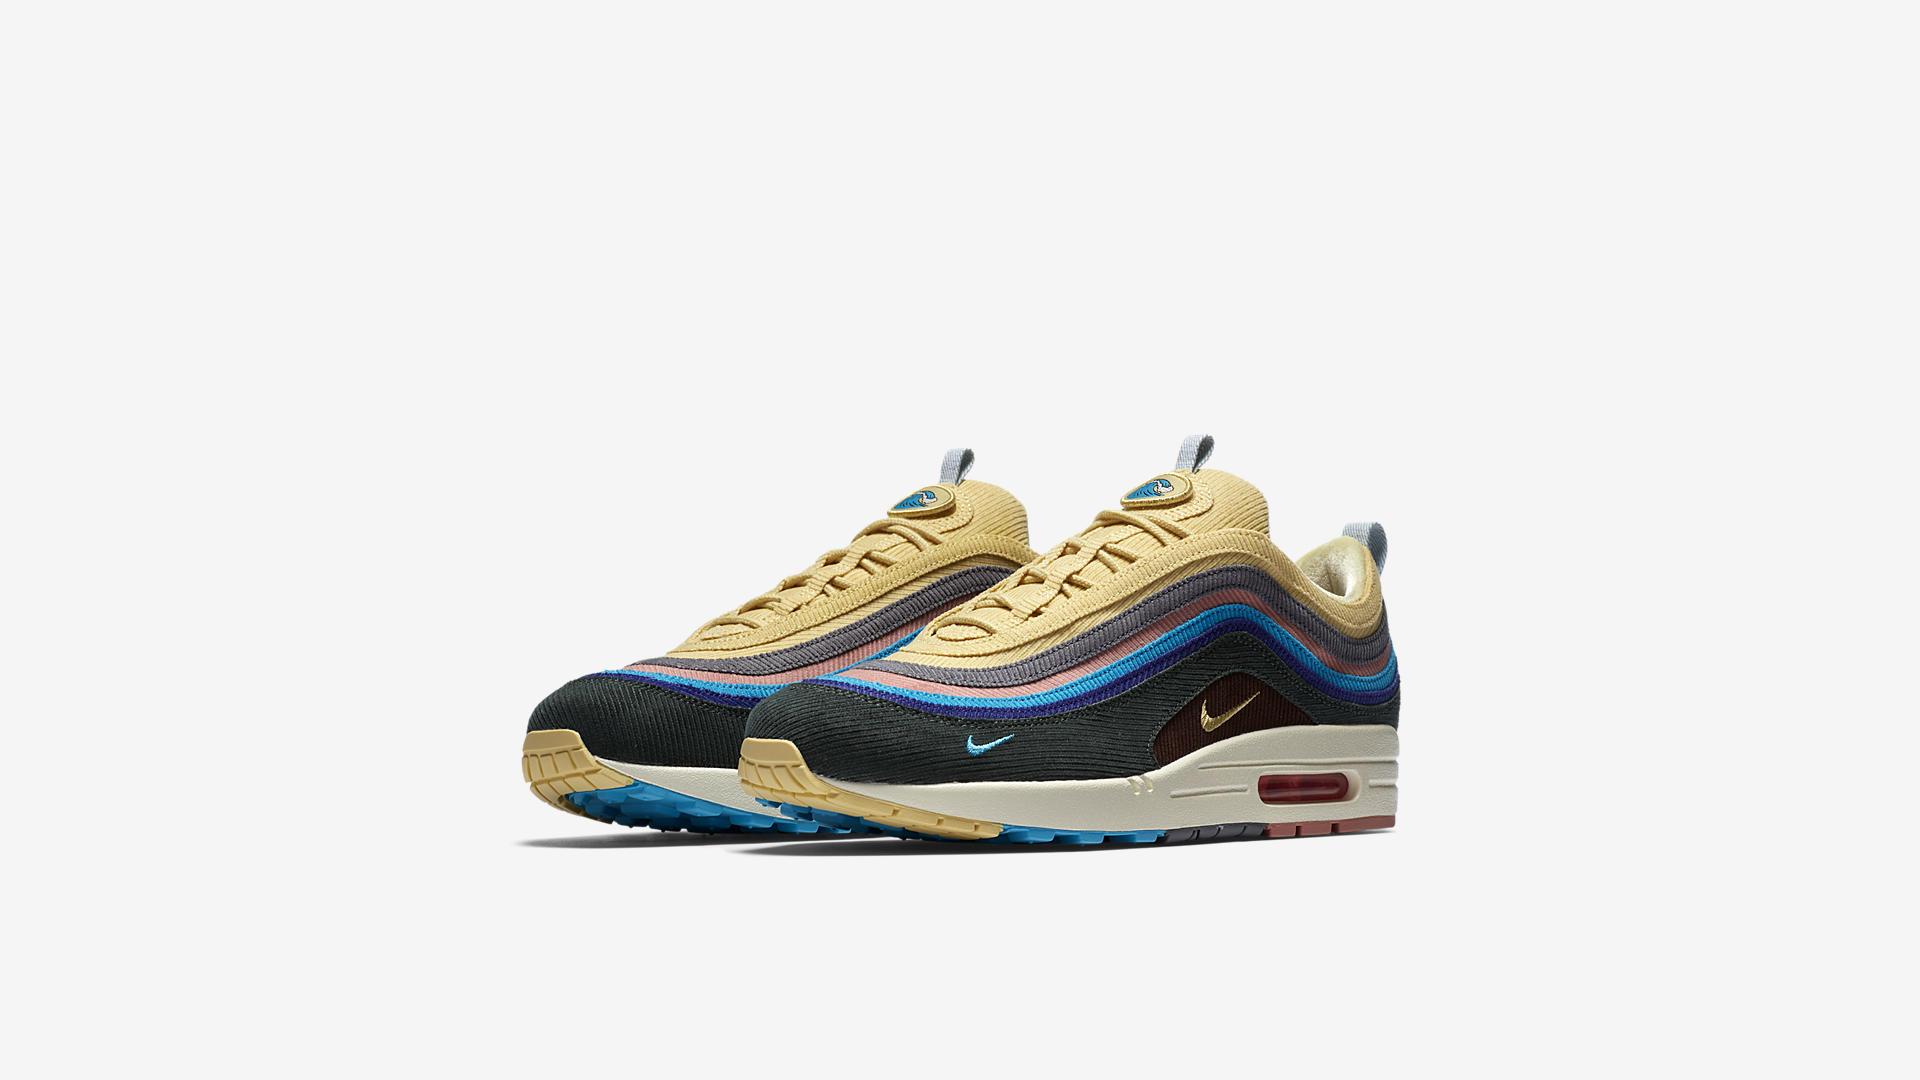 AJ4219 400 Nike Air Max 1 97 Sean Wotherspoon 6